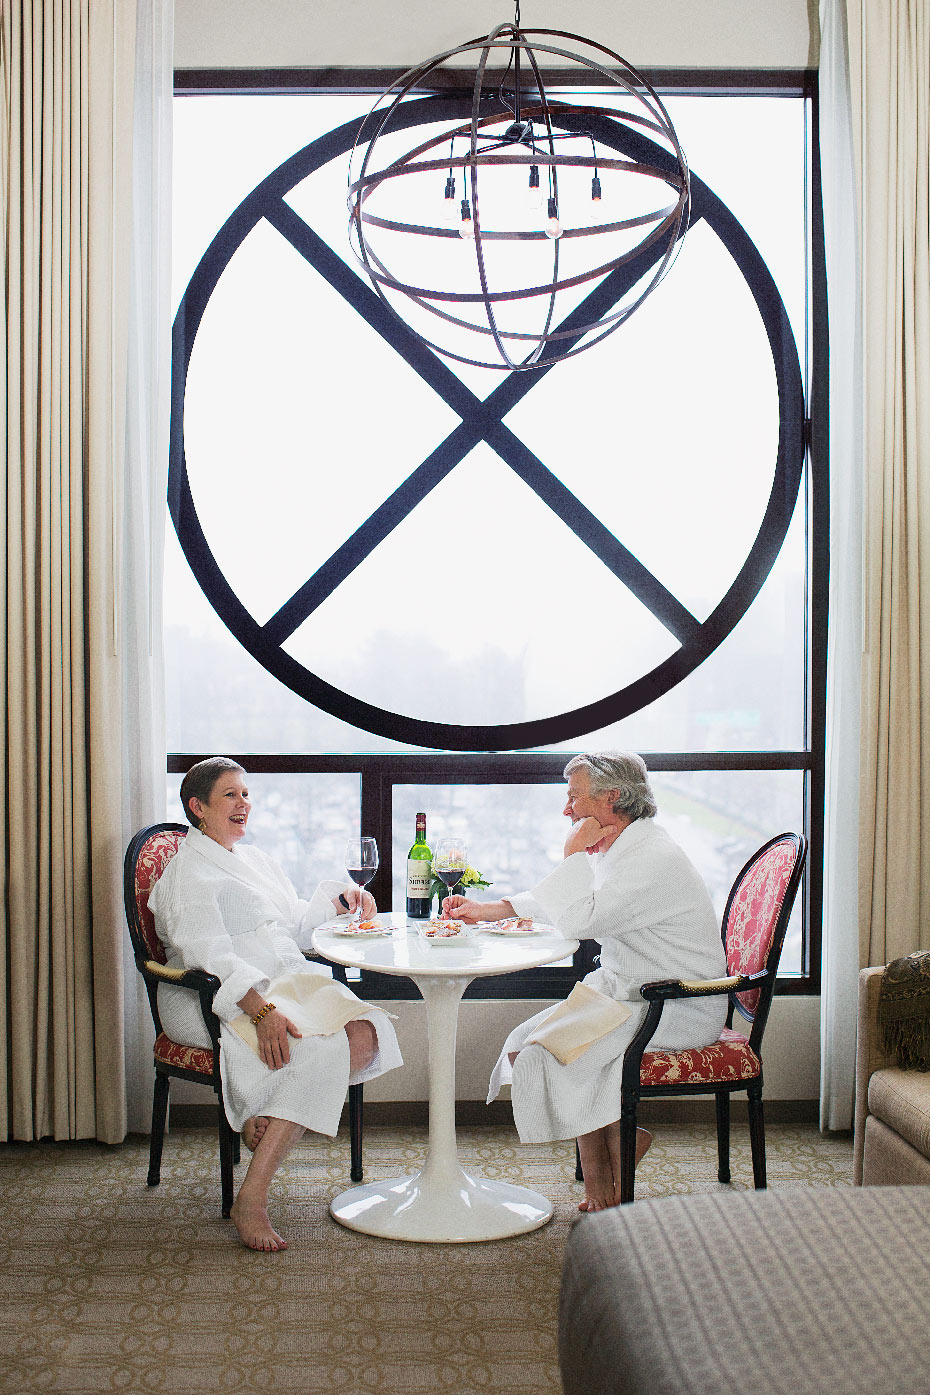 Stacey Van Berkel Photography I Dennis & Nancy Quaintence having wine in bathrobes I Proximity Hotel I Luxury living I